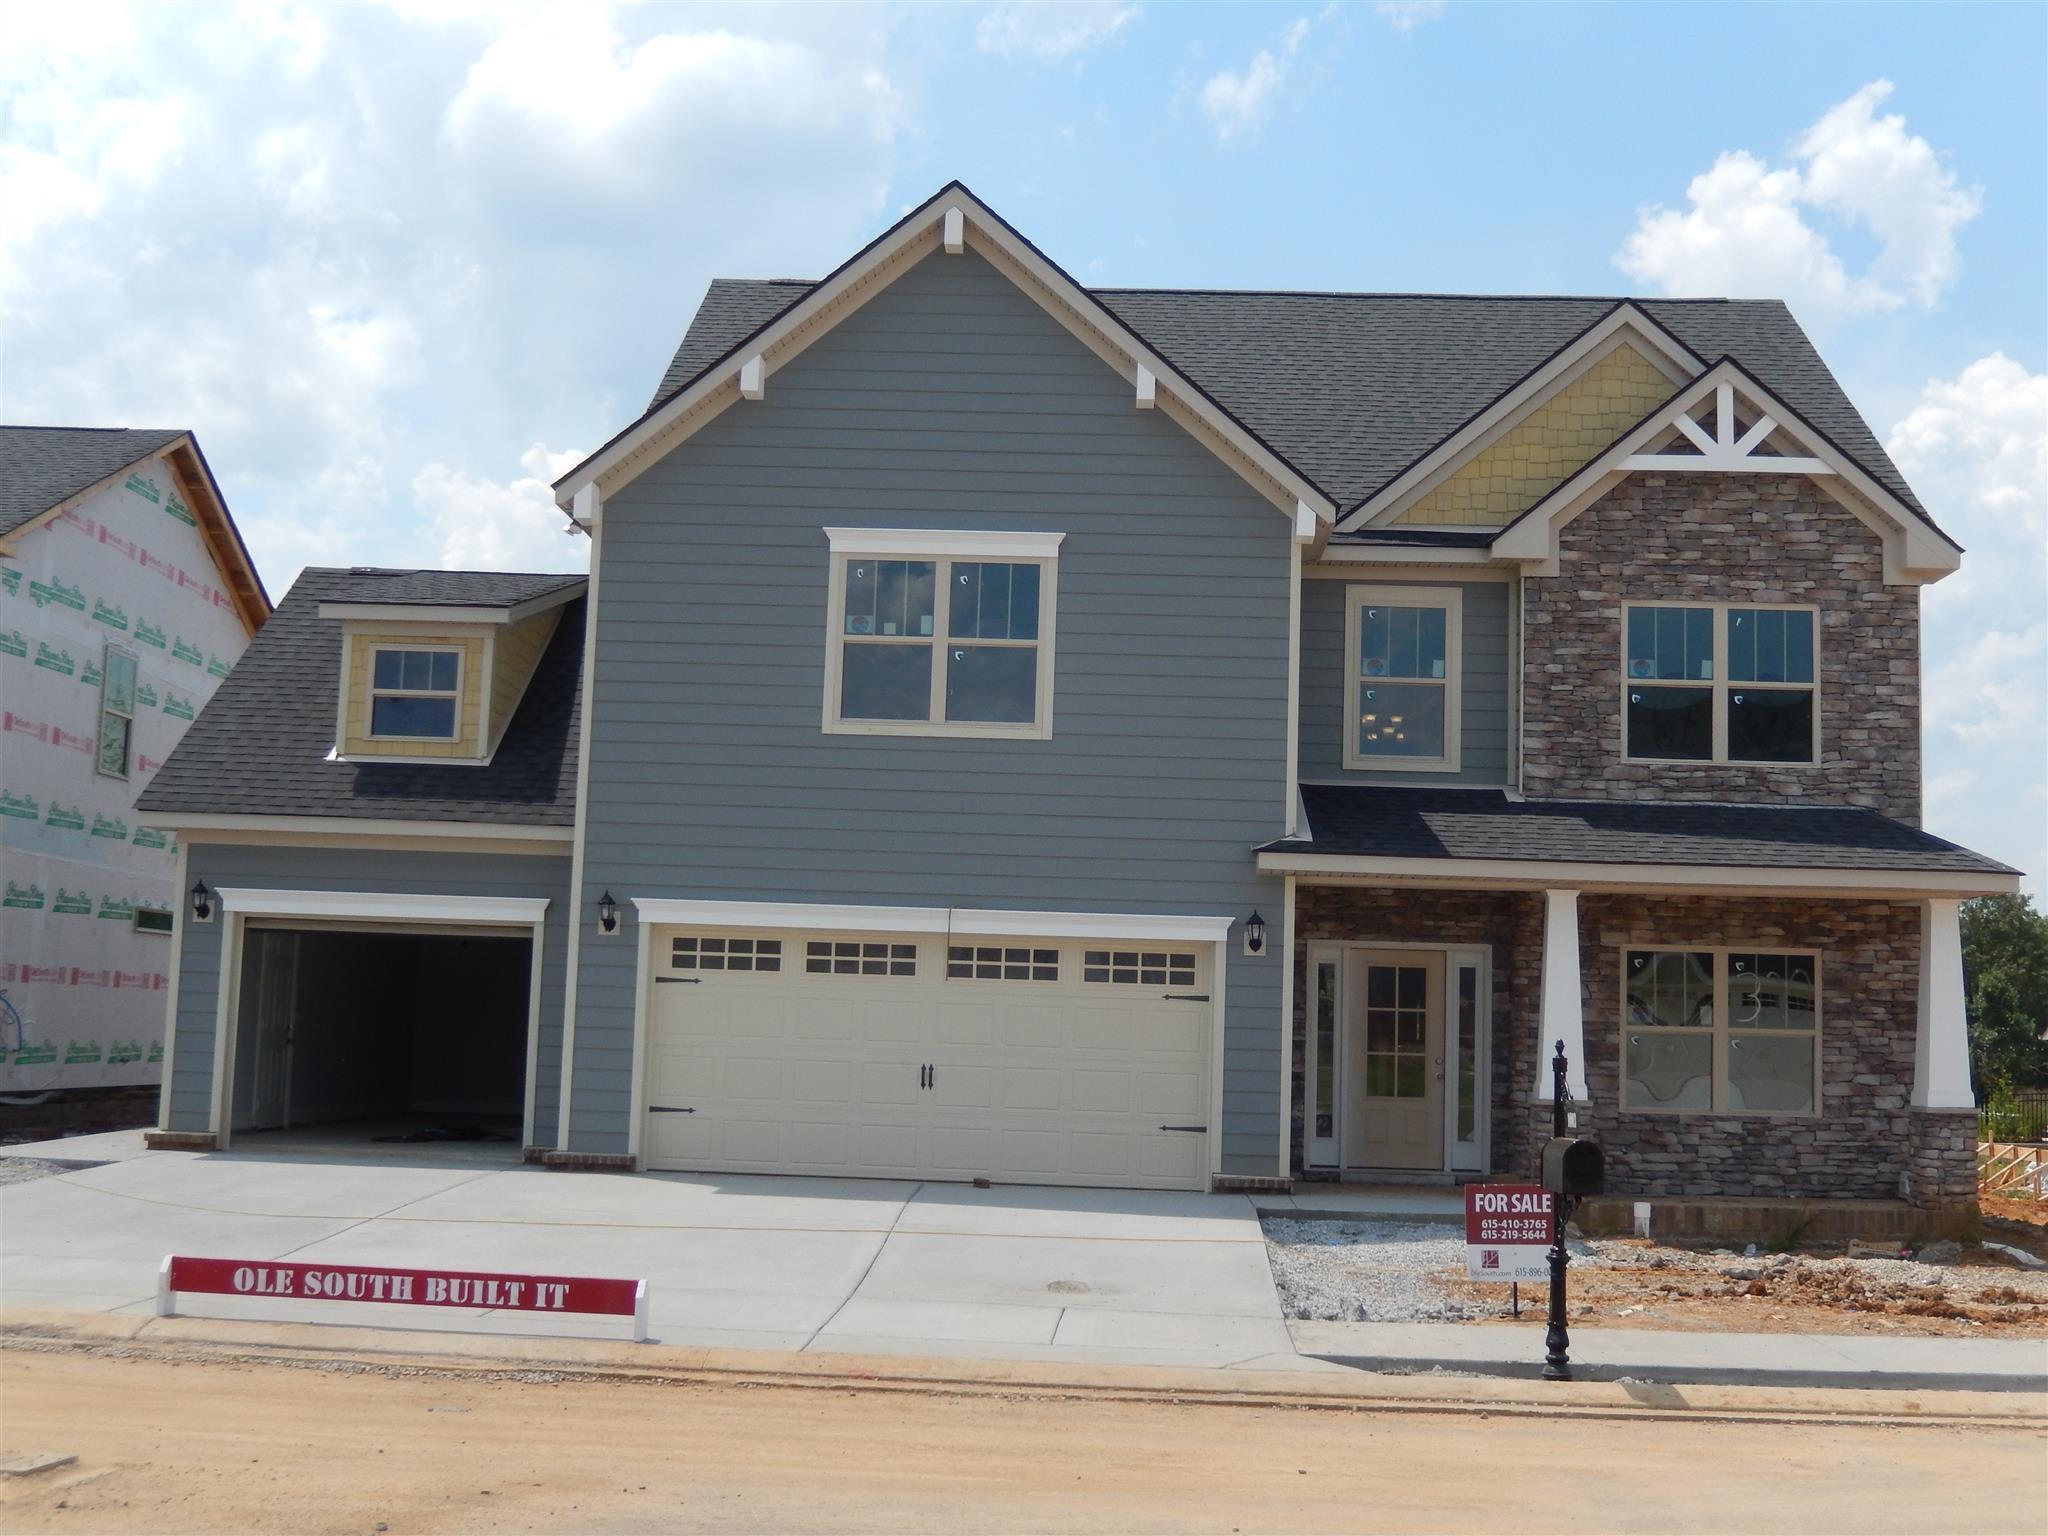 1003 Licinius Lane #320, Murfreesboro, TN 37128 - Murfreesboro, TN real estate listing